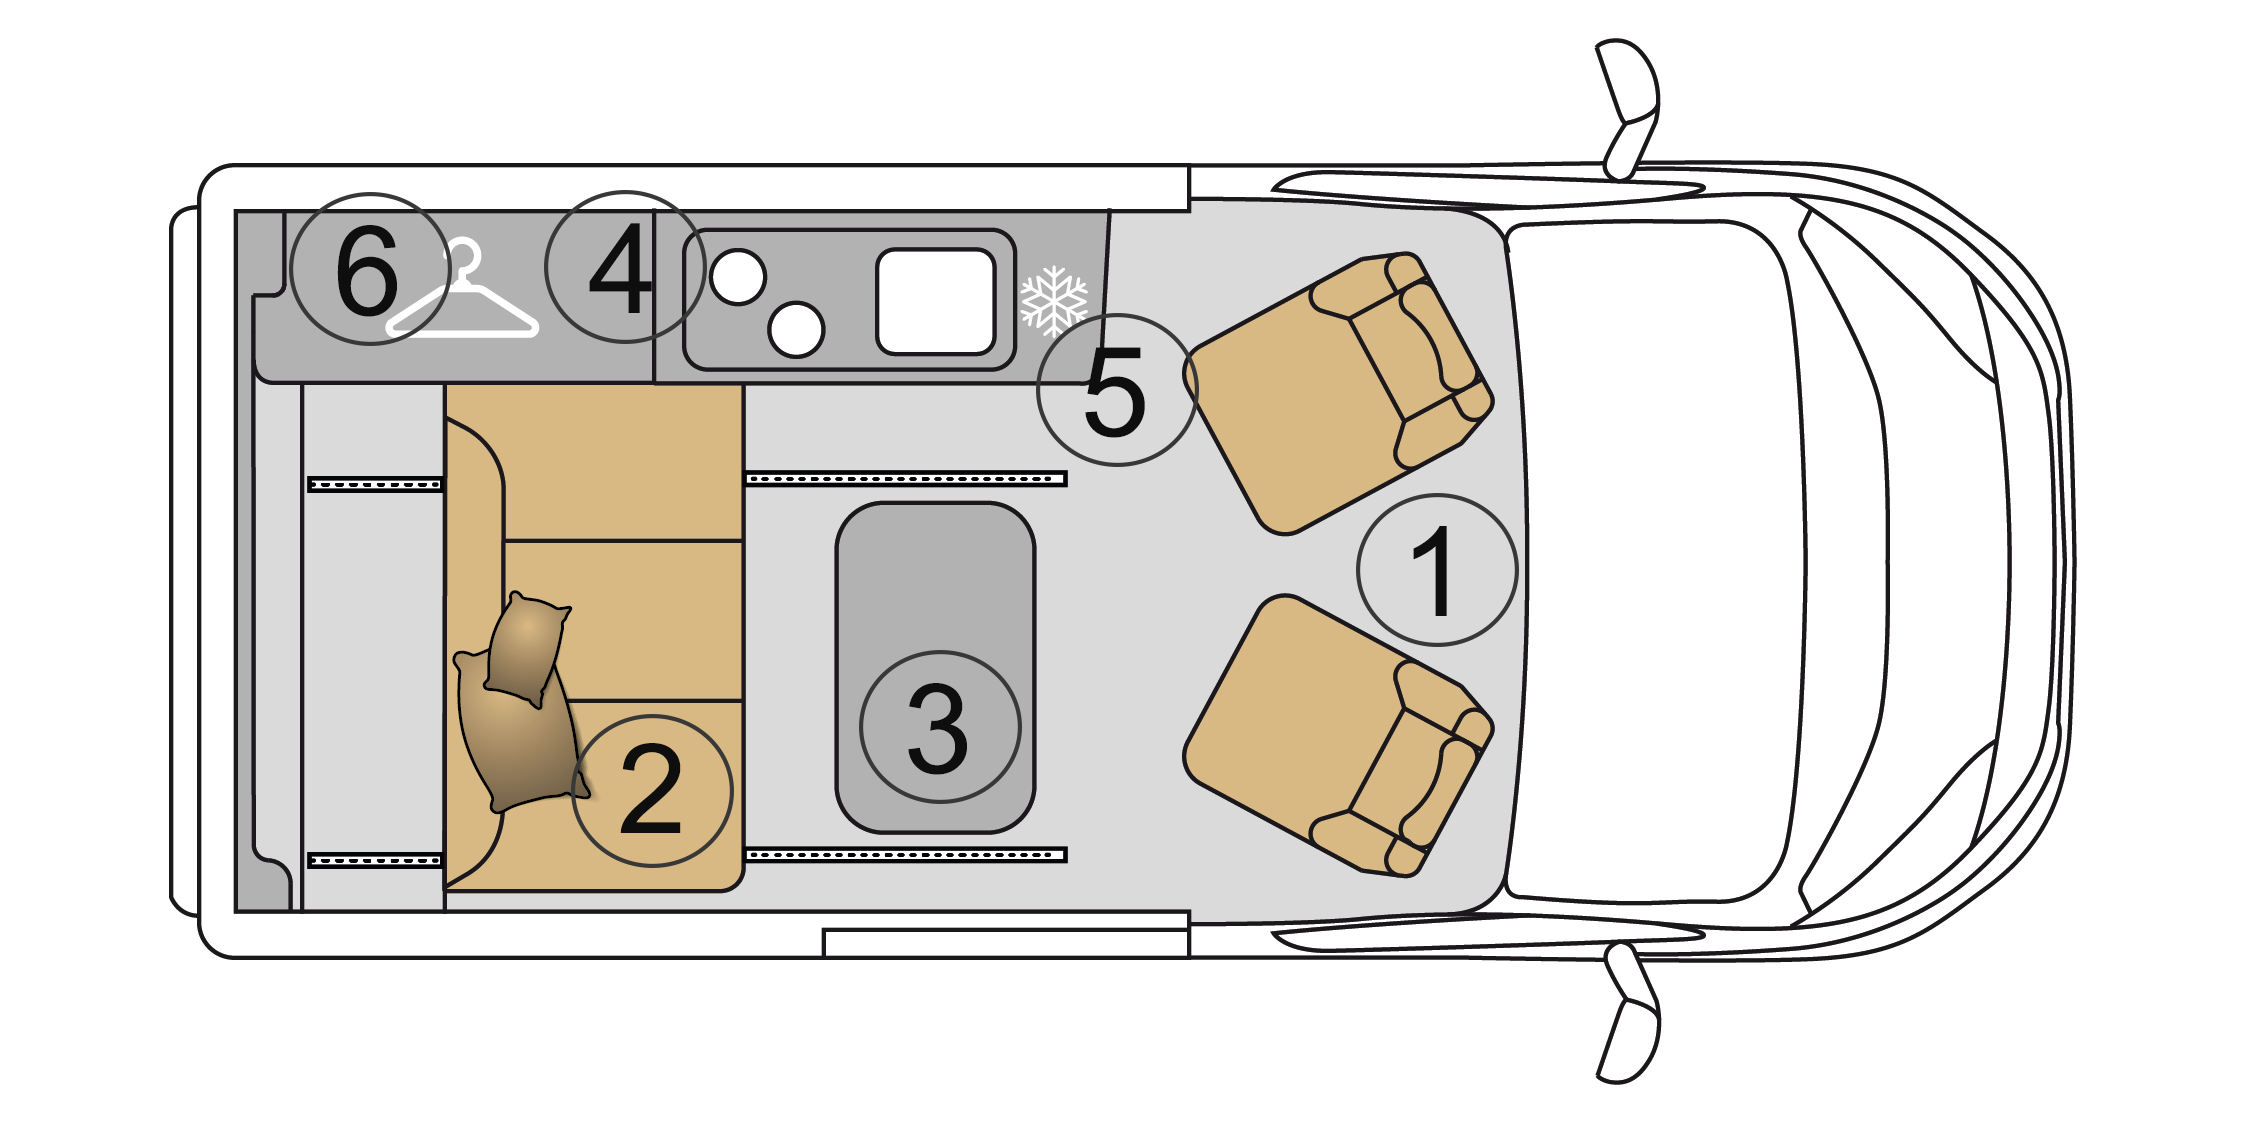 Campervan 3 Grundriss campingbus